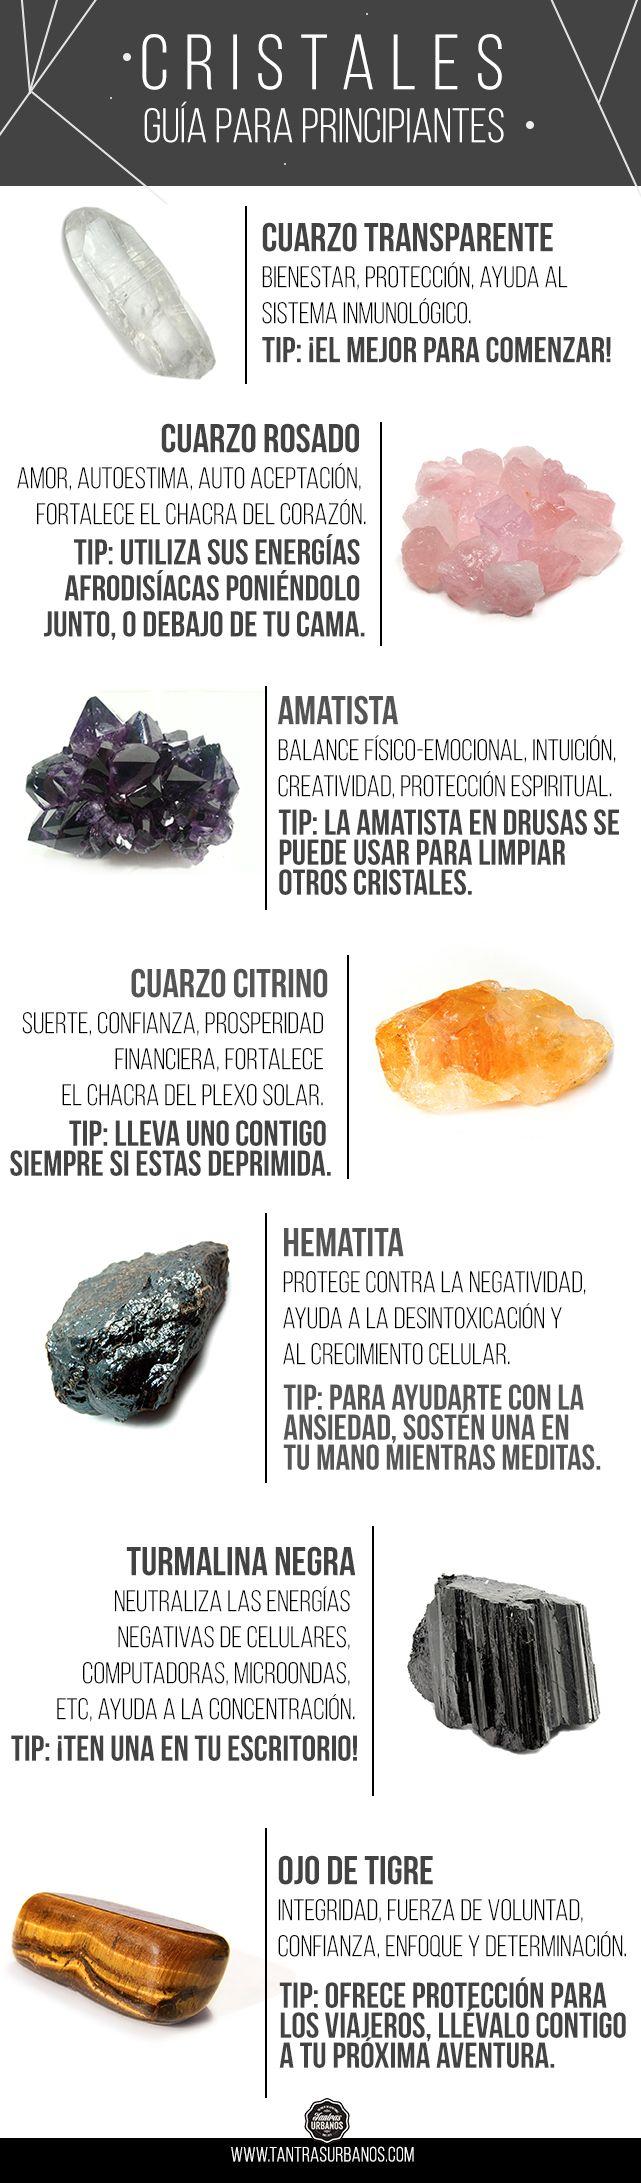 infografia cristales (1)